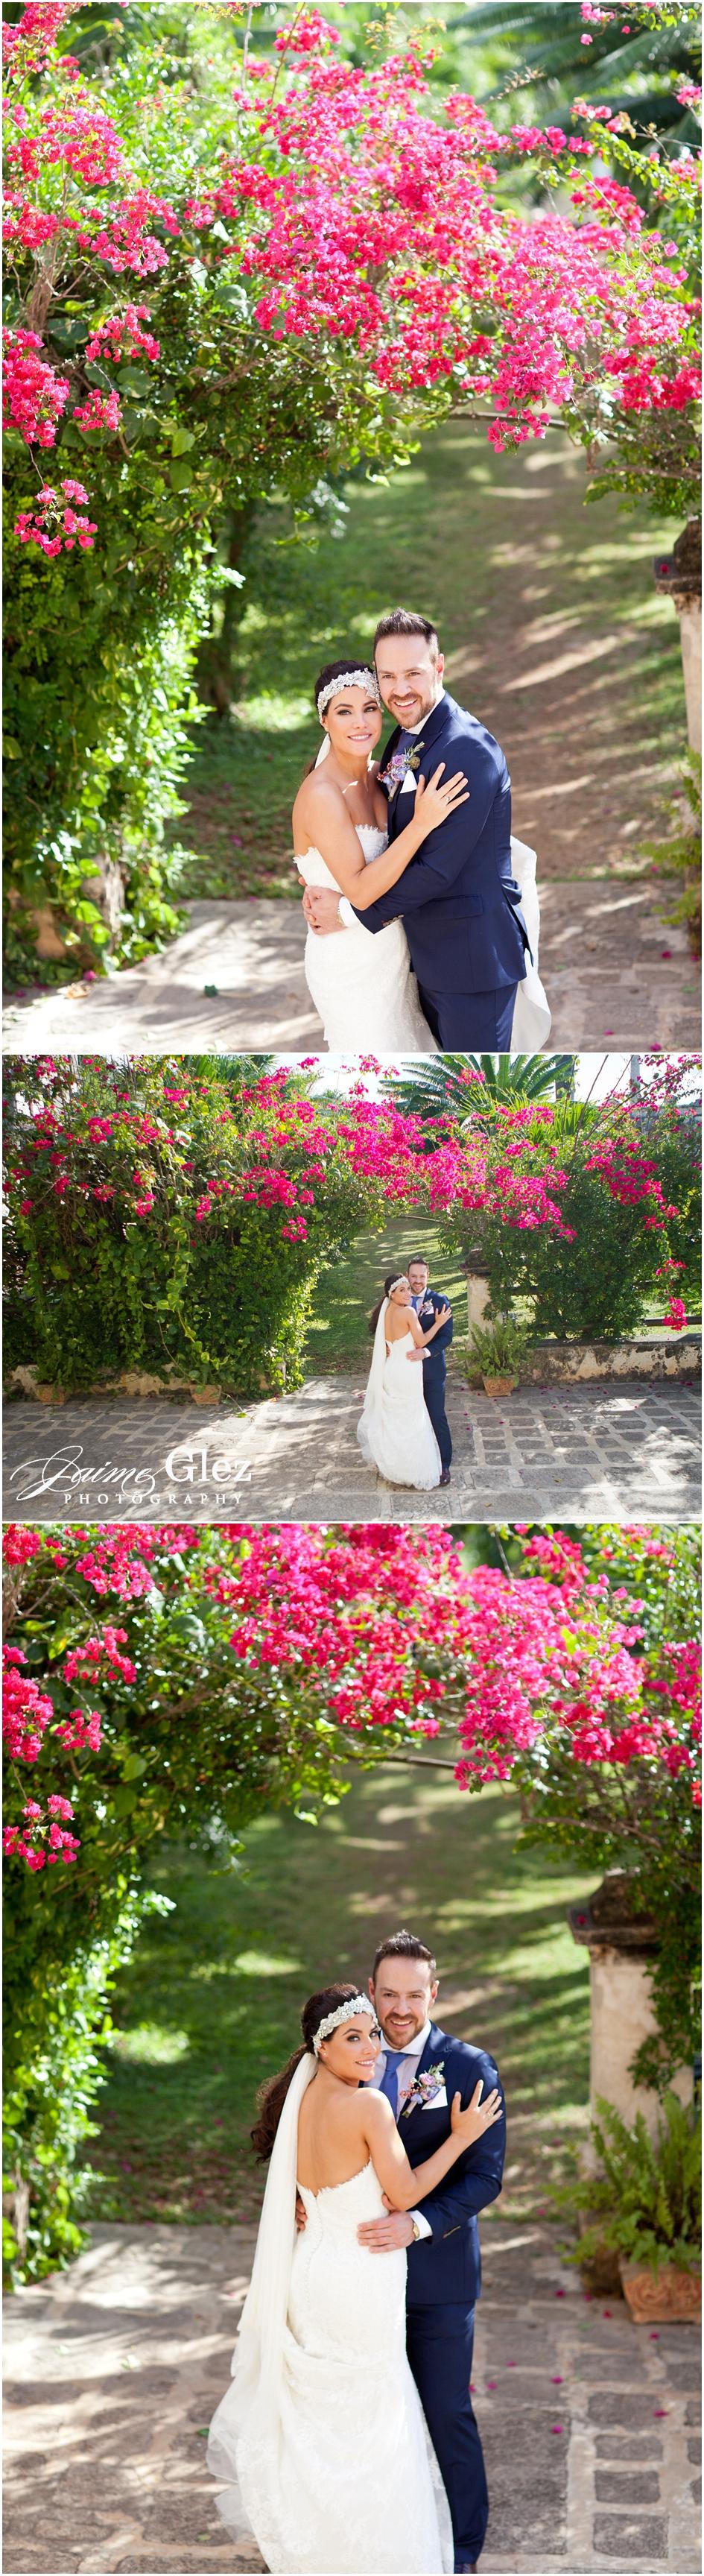 hacienda yaxcopoil boda yucatan mexico 8